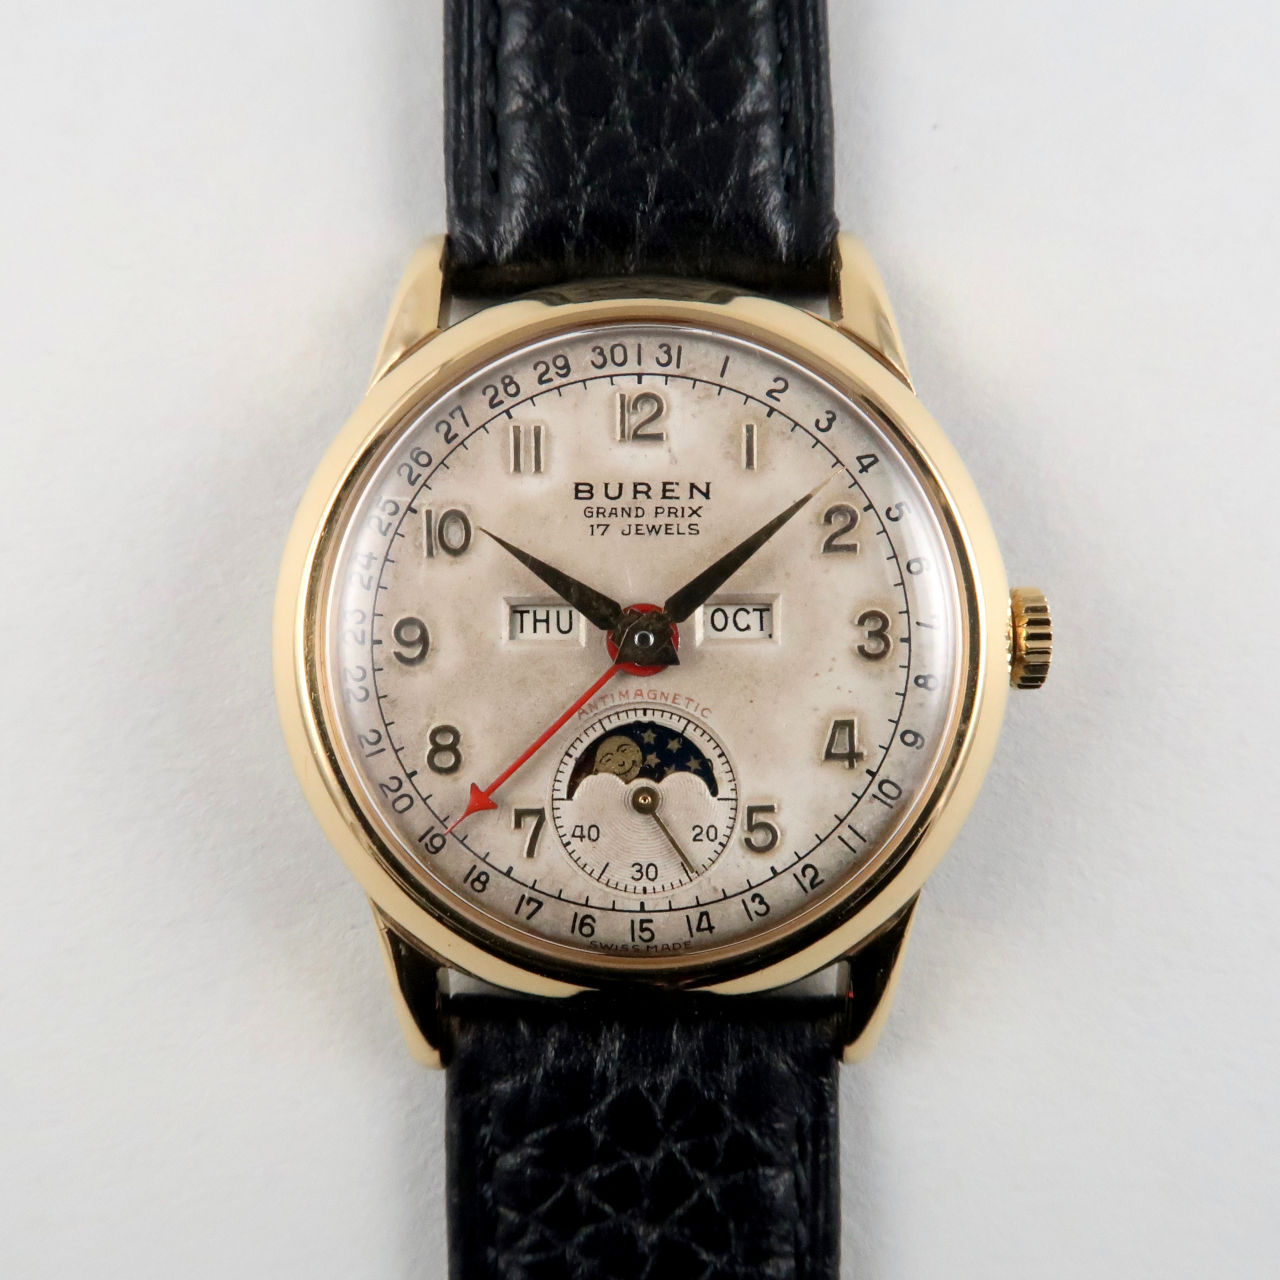 Buren Grand Prix gold plated vintage calendar wristwatch, circa 1950